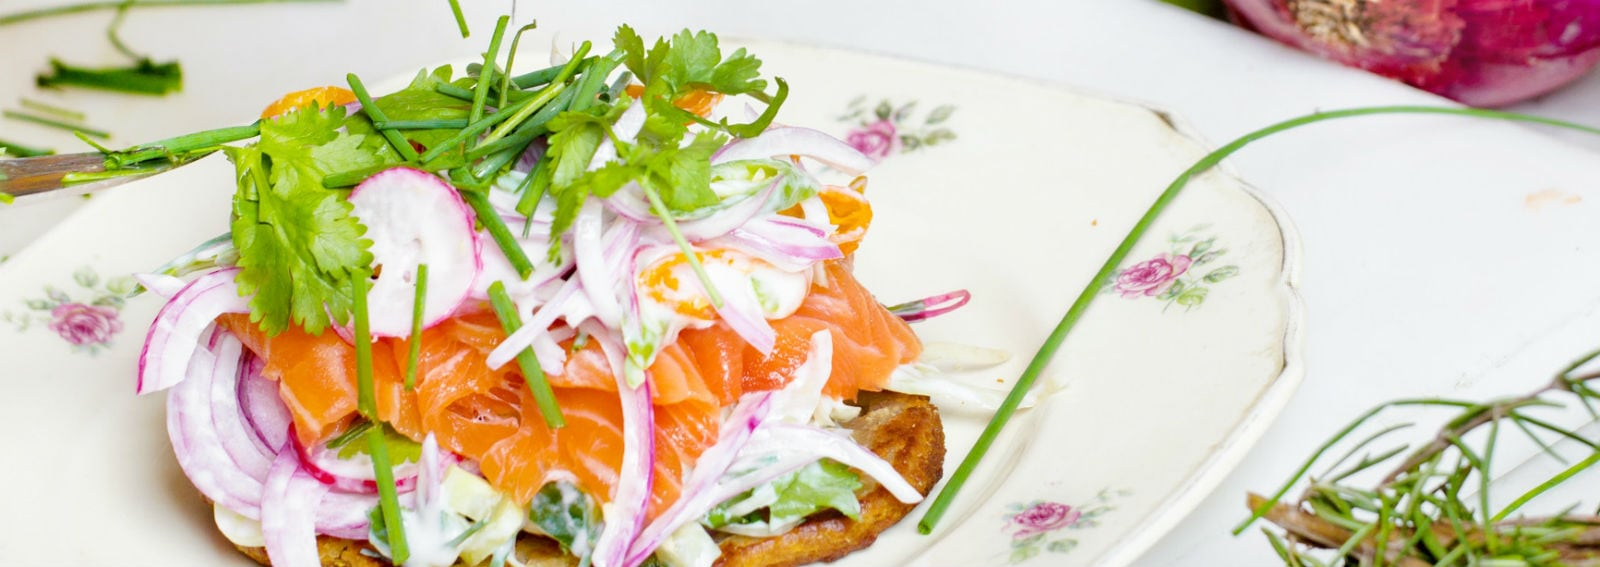 salmone verdura piatto ( desktop)